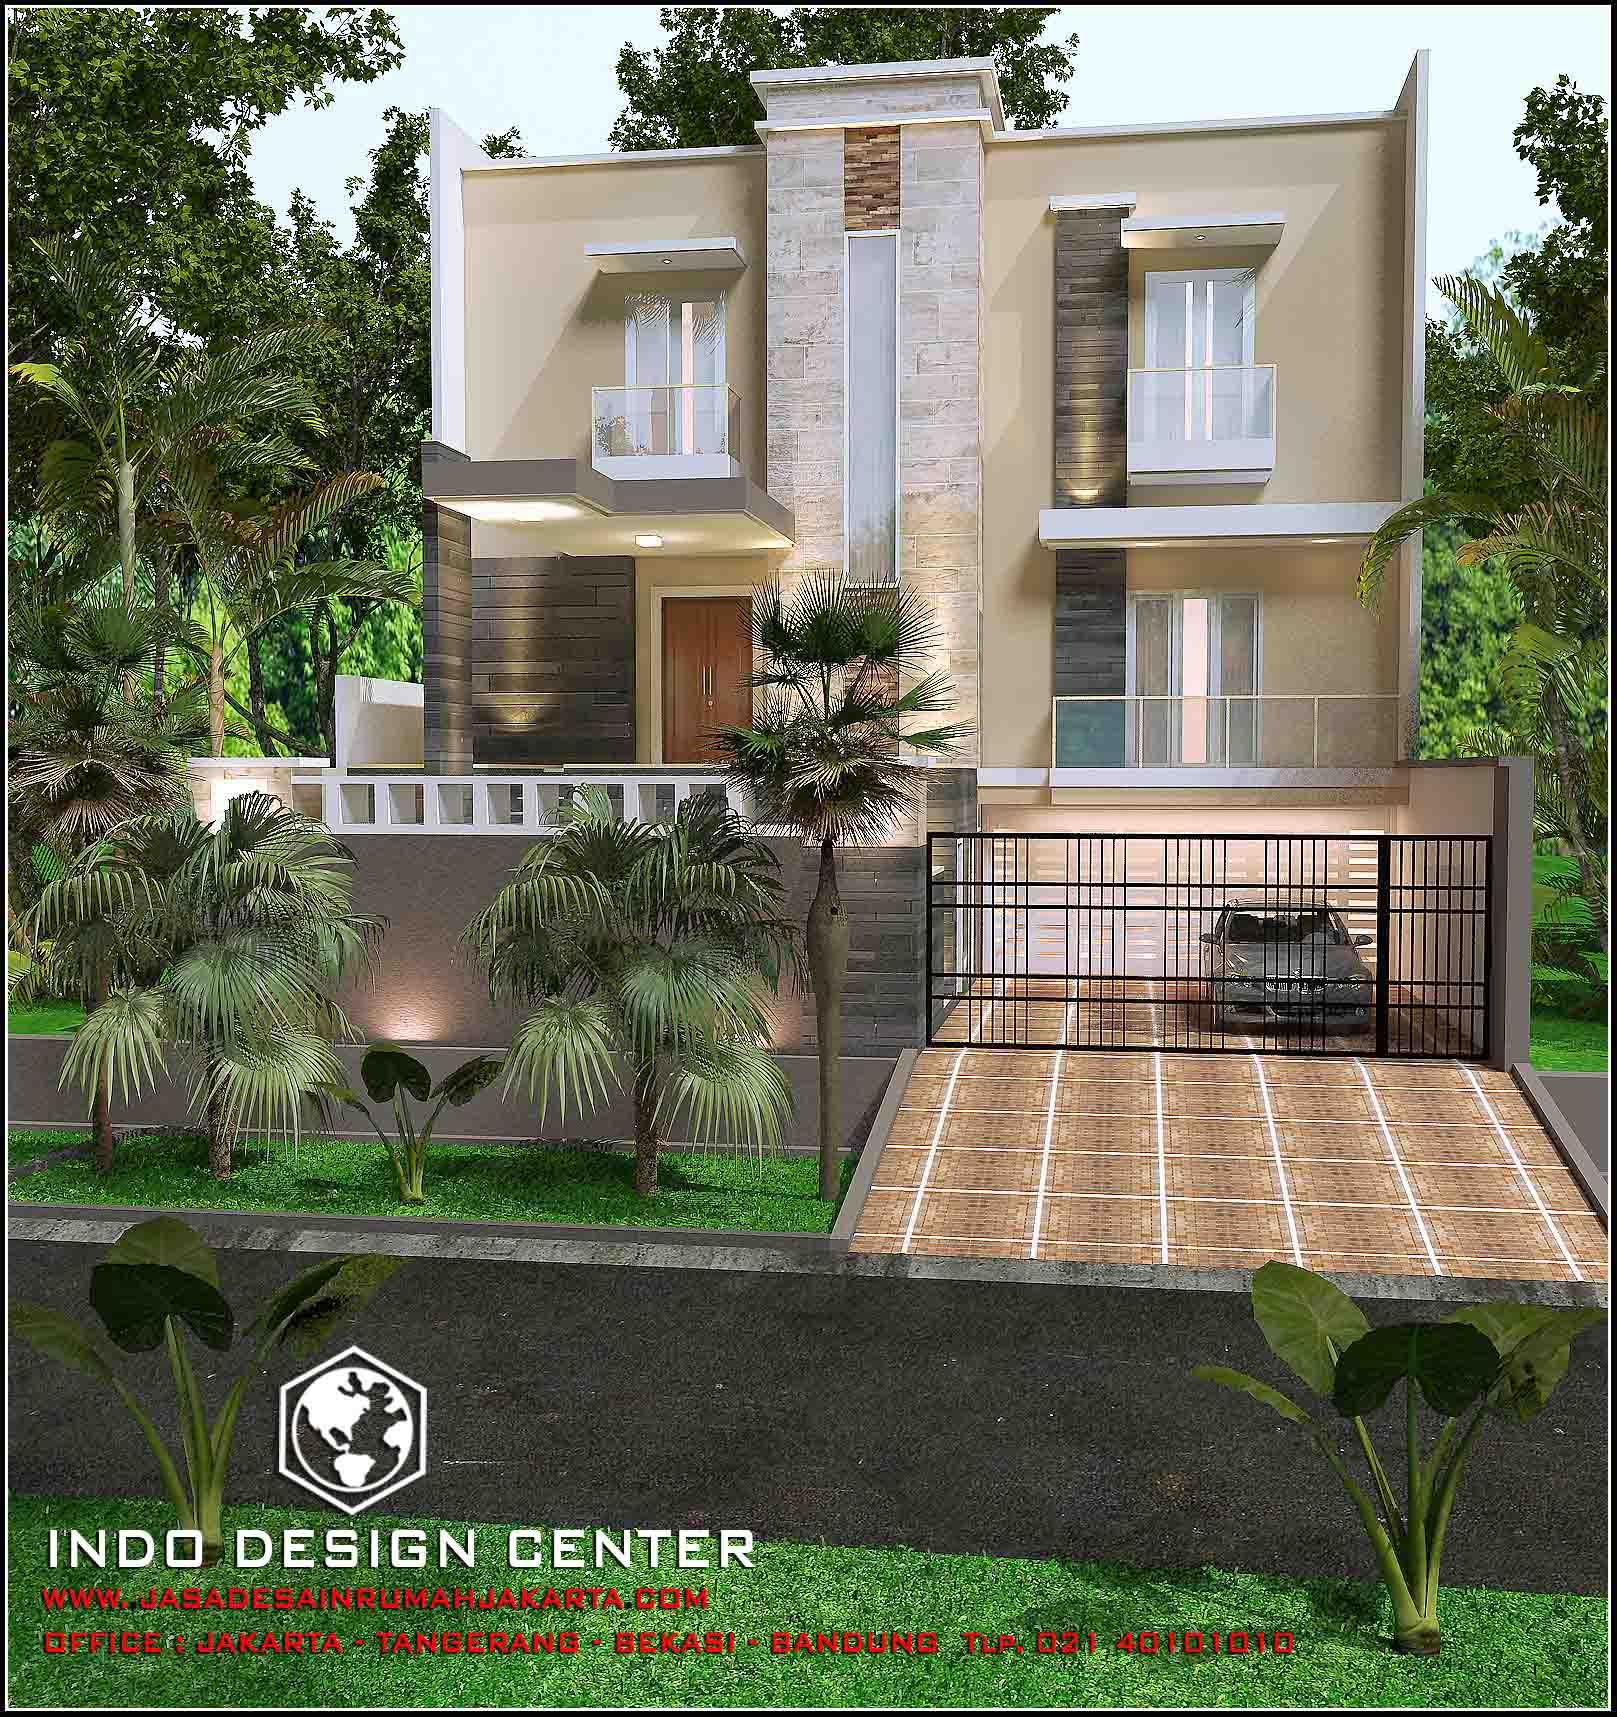 Interior kantor minimalis tropis 3 lantai - Rumah Minimalis 3 Lantai Tampak 2 Lantai Karya Arsitek Idc